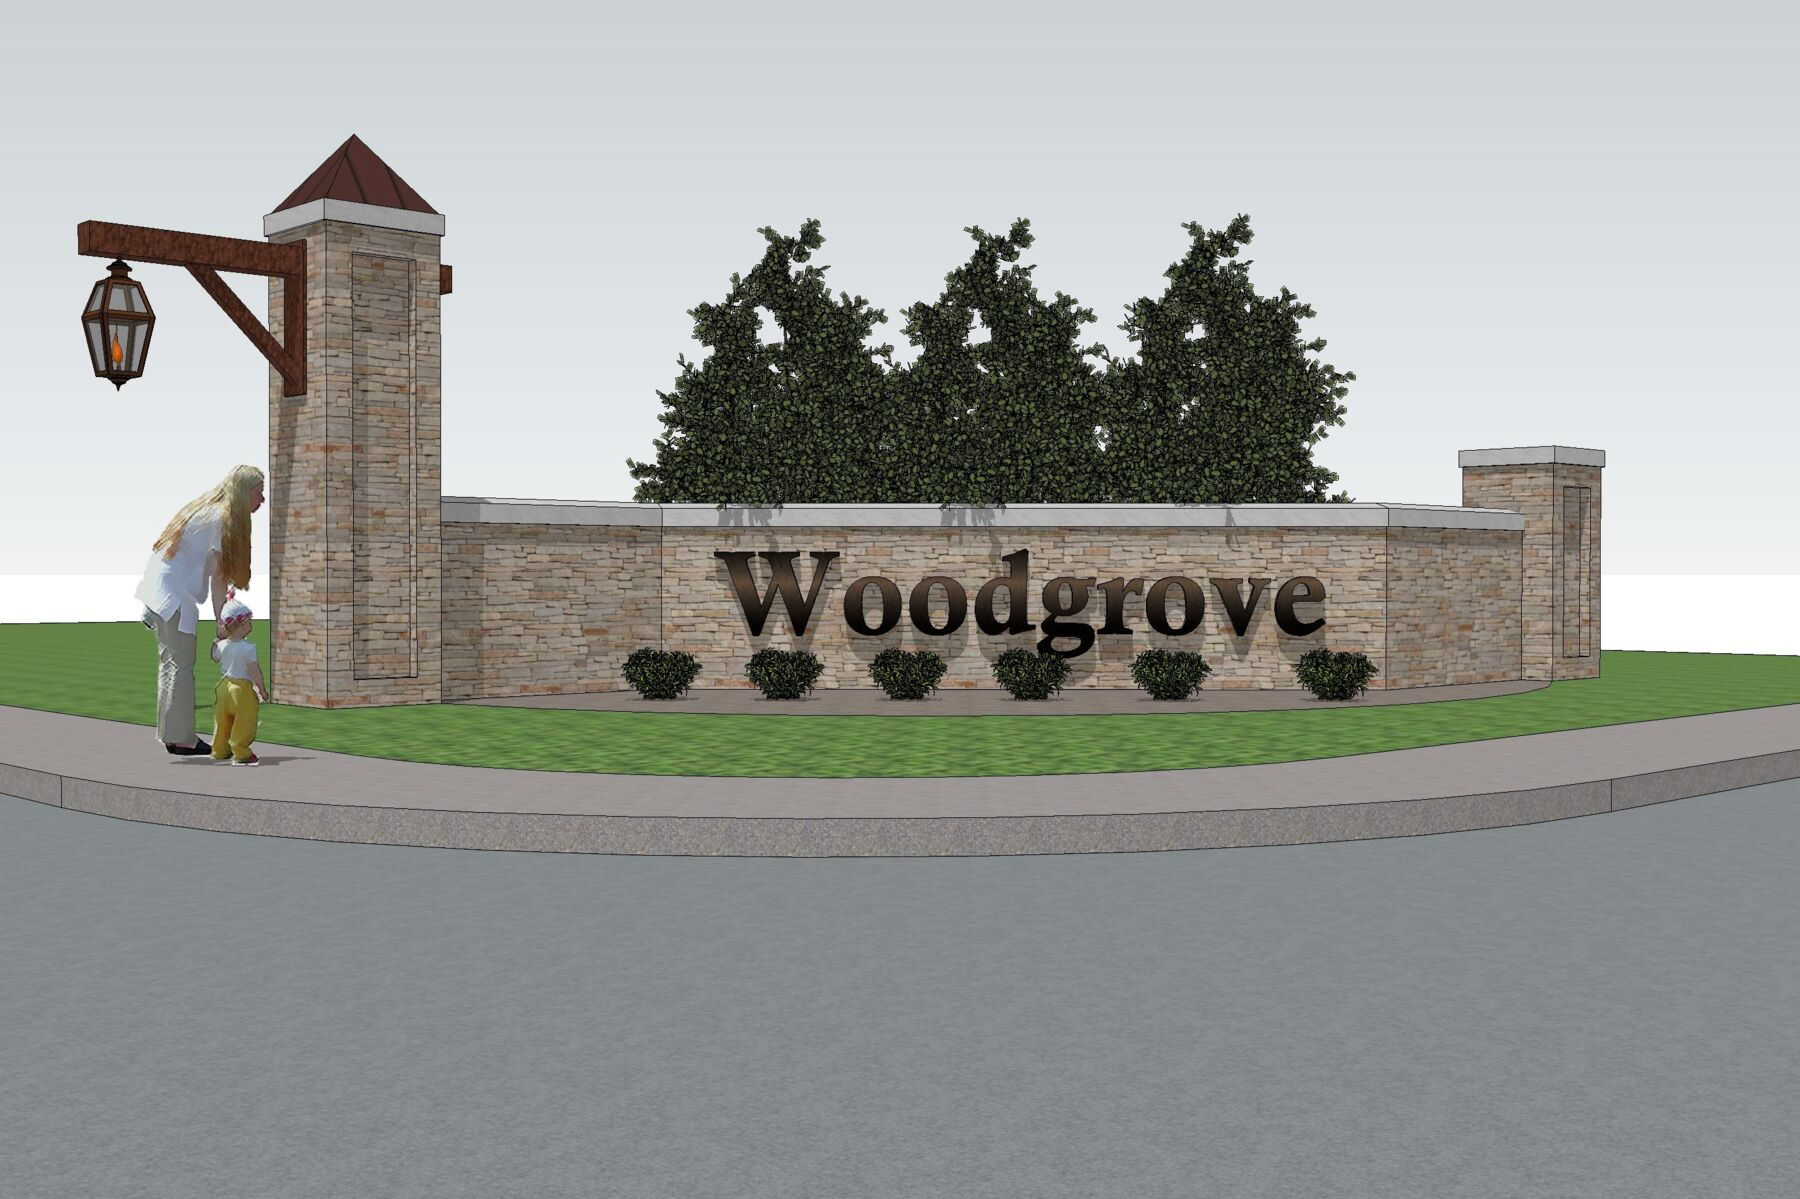 Woodgrove Entrance